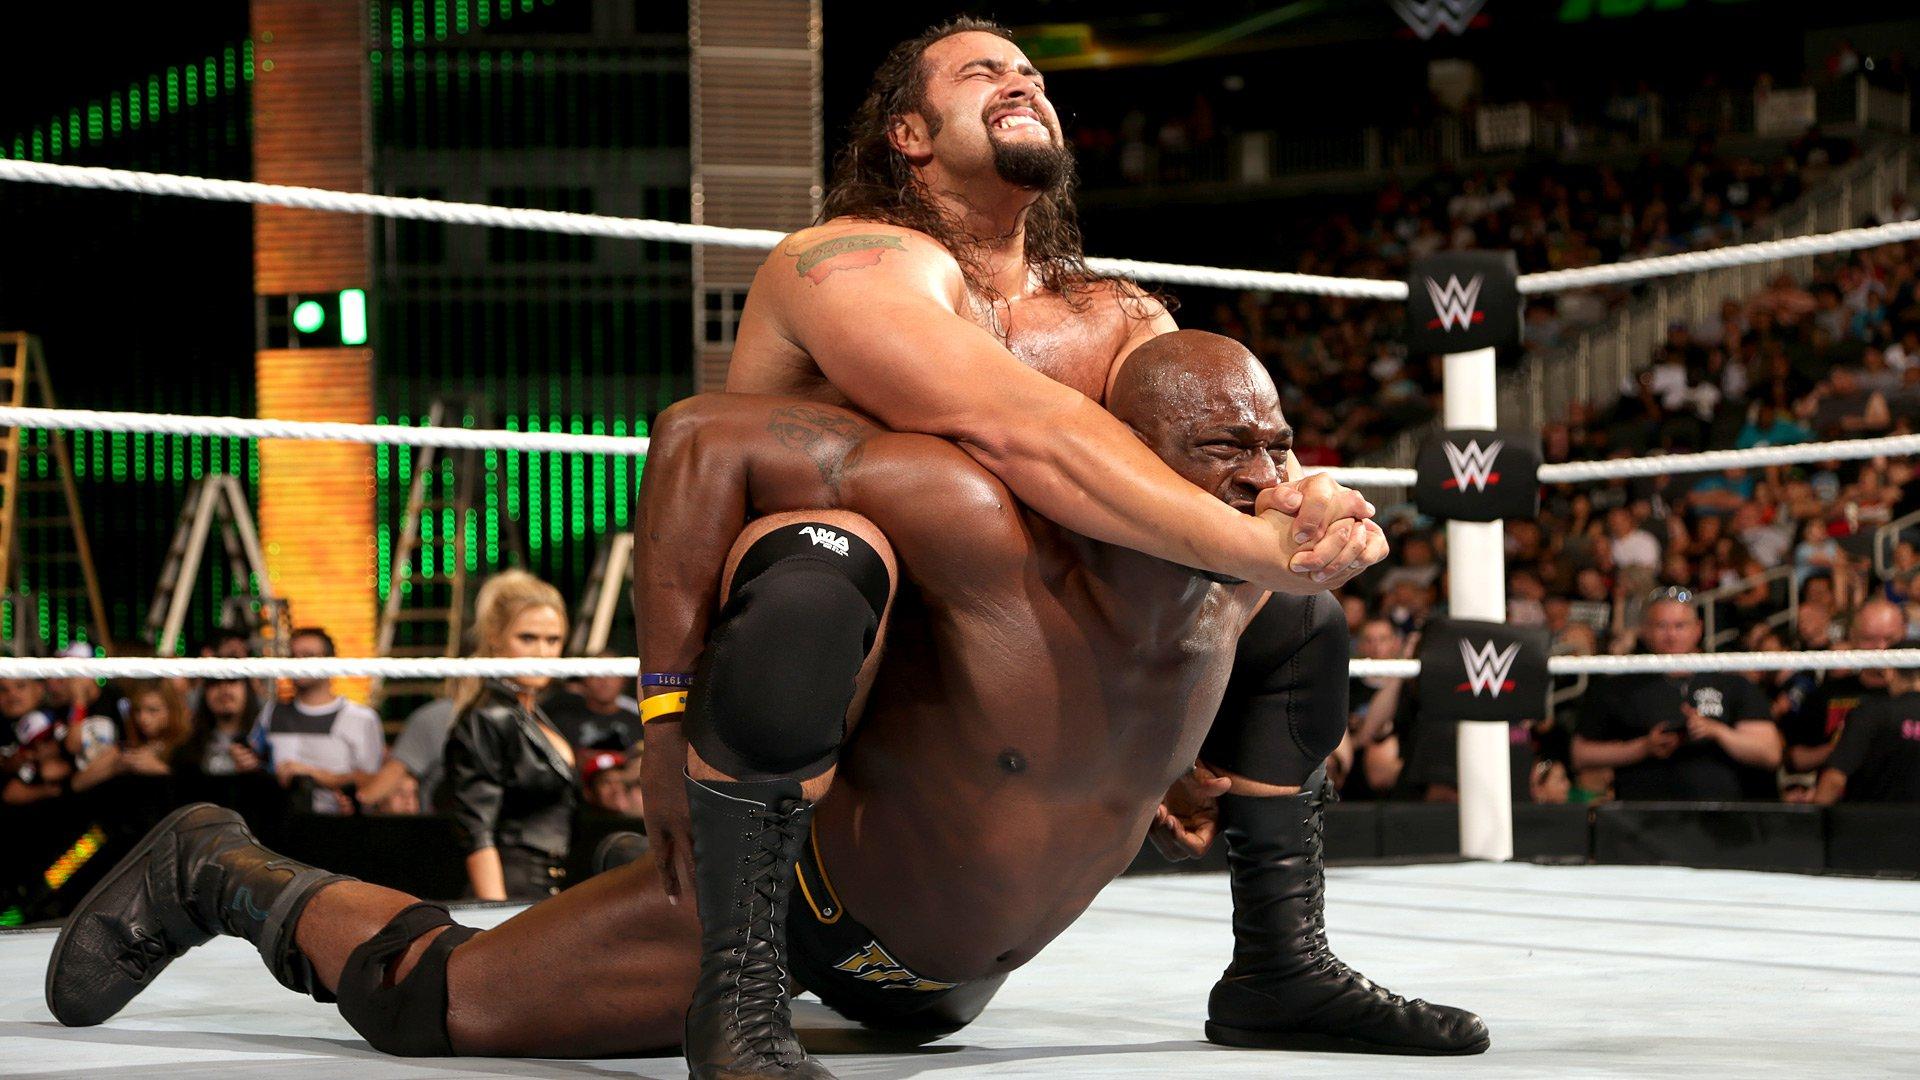 WWE Network: Titus O'Neil vs. Rusev - Match de Championnat U.S.: WWE Money in the Bank 2016